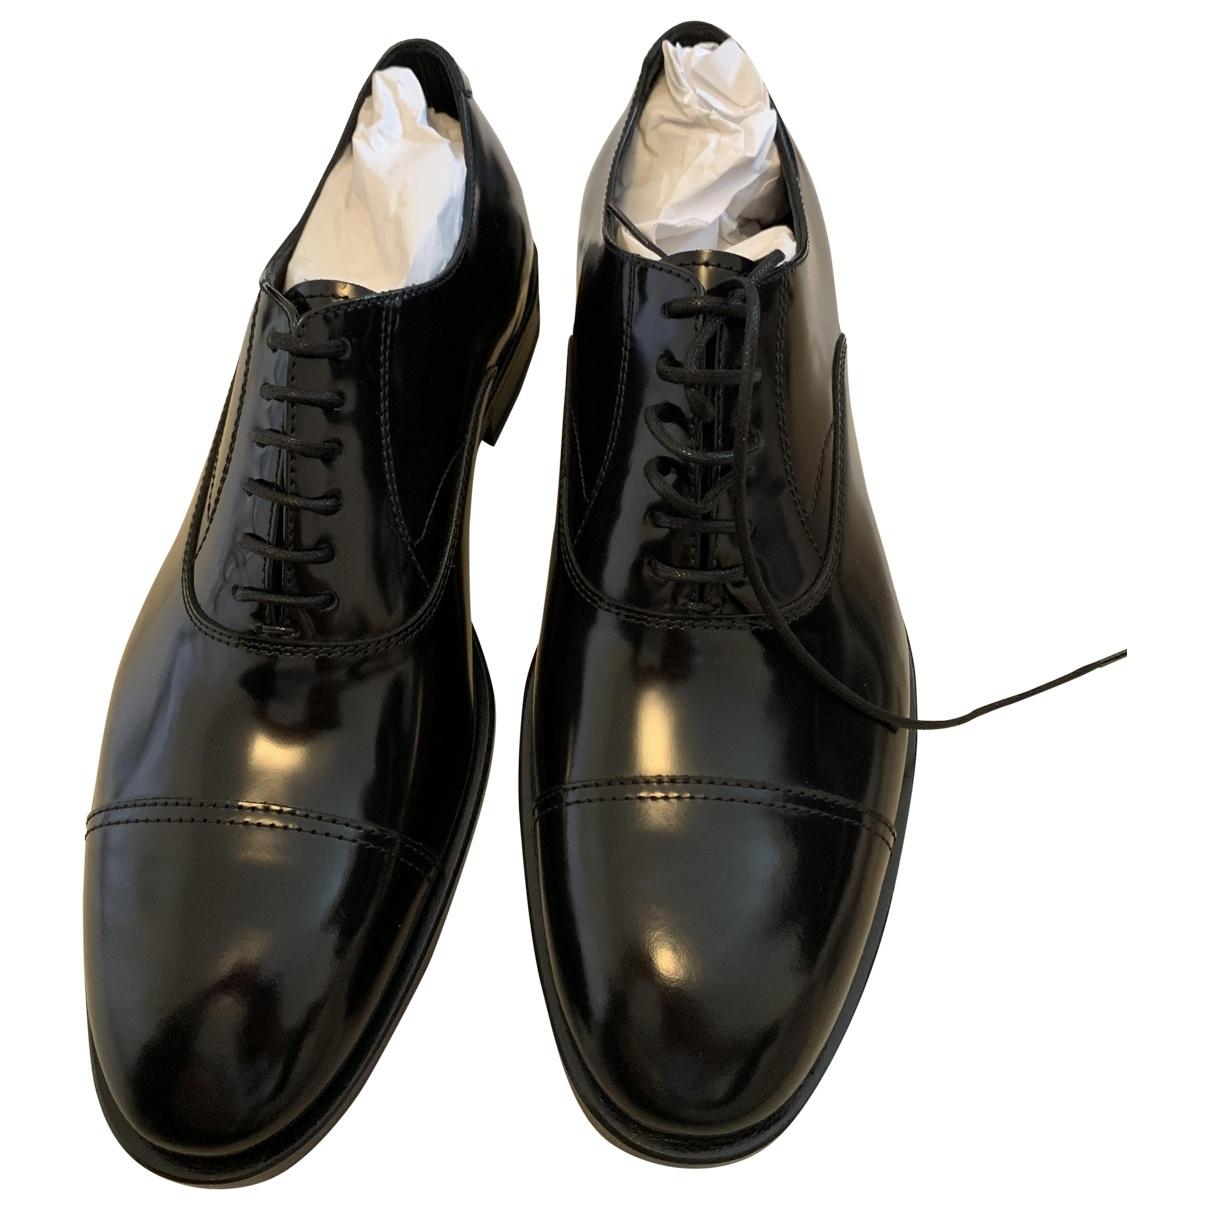 Philipp Plein \N Black Leather Lace ups for Men 41 EU